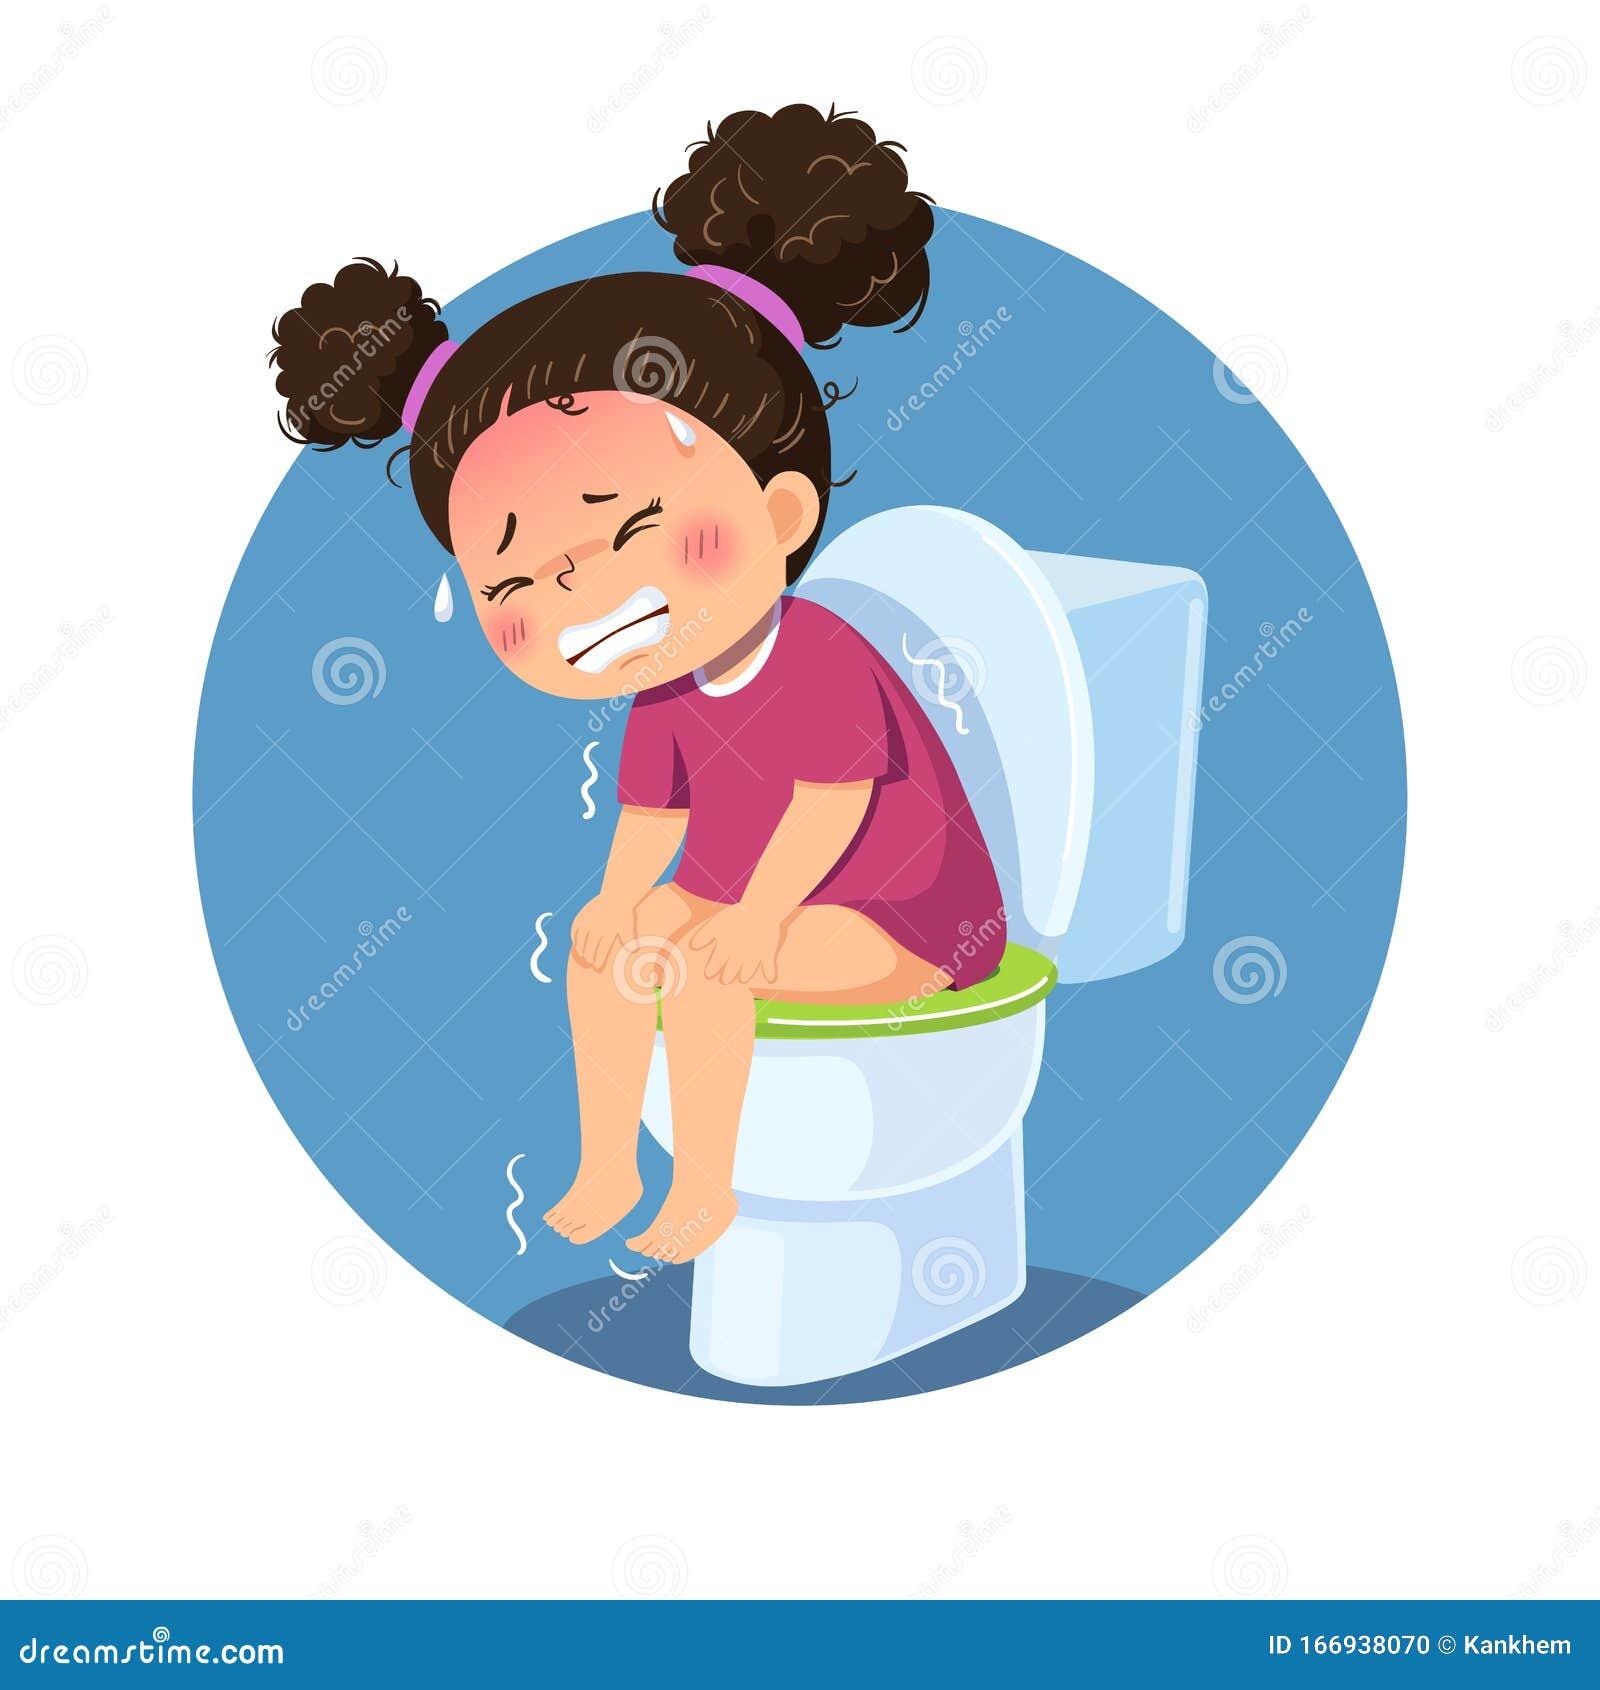 Diarrhea Cartoon Stock Illustrations 1 509 Diarrhea Cartoon Stock Illustrations Vectors Clipart Dreamstime